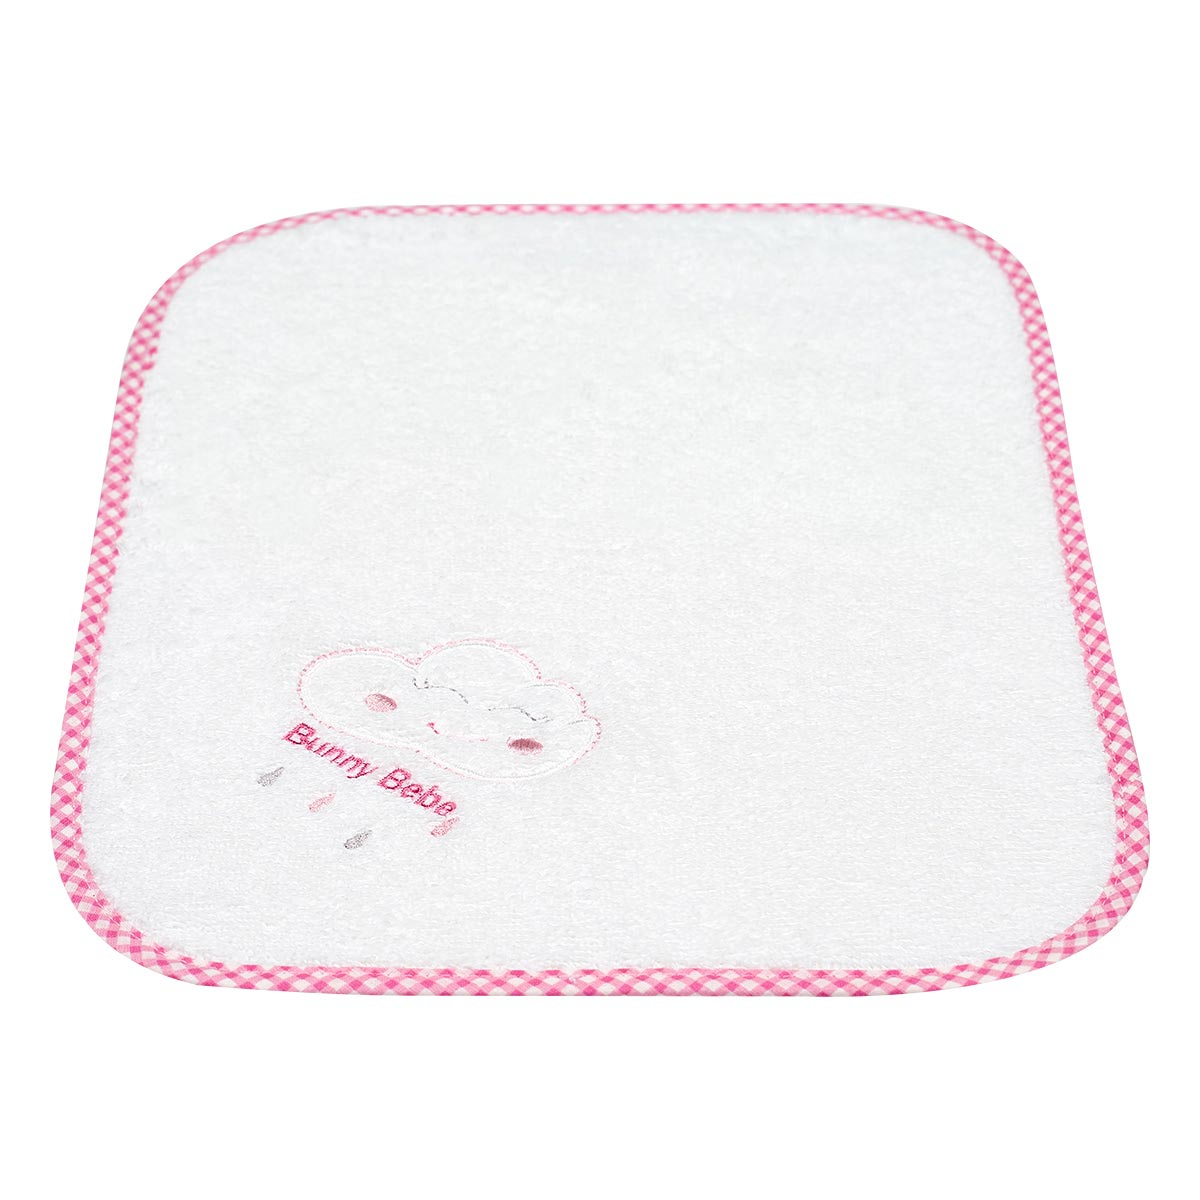 Bunny bebe λαβέτα πετσετέ με κέντημα και ρέλι σύννεφο ροζ